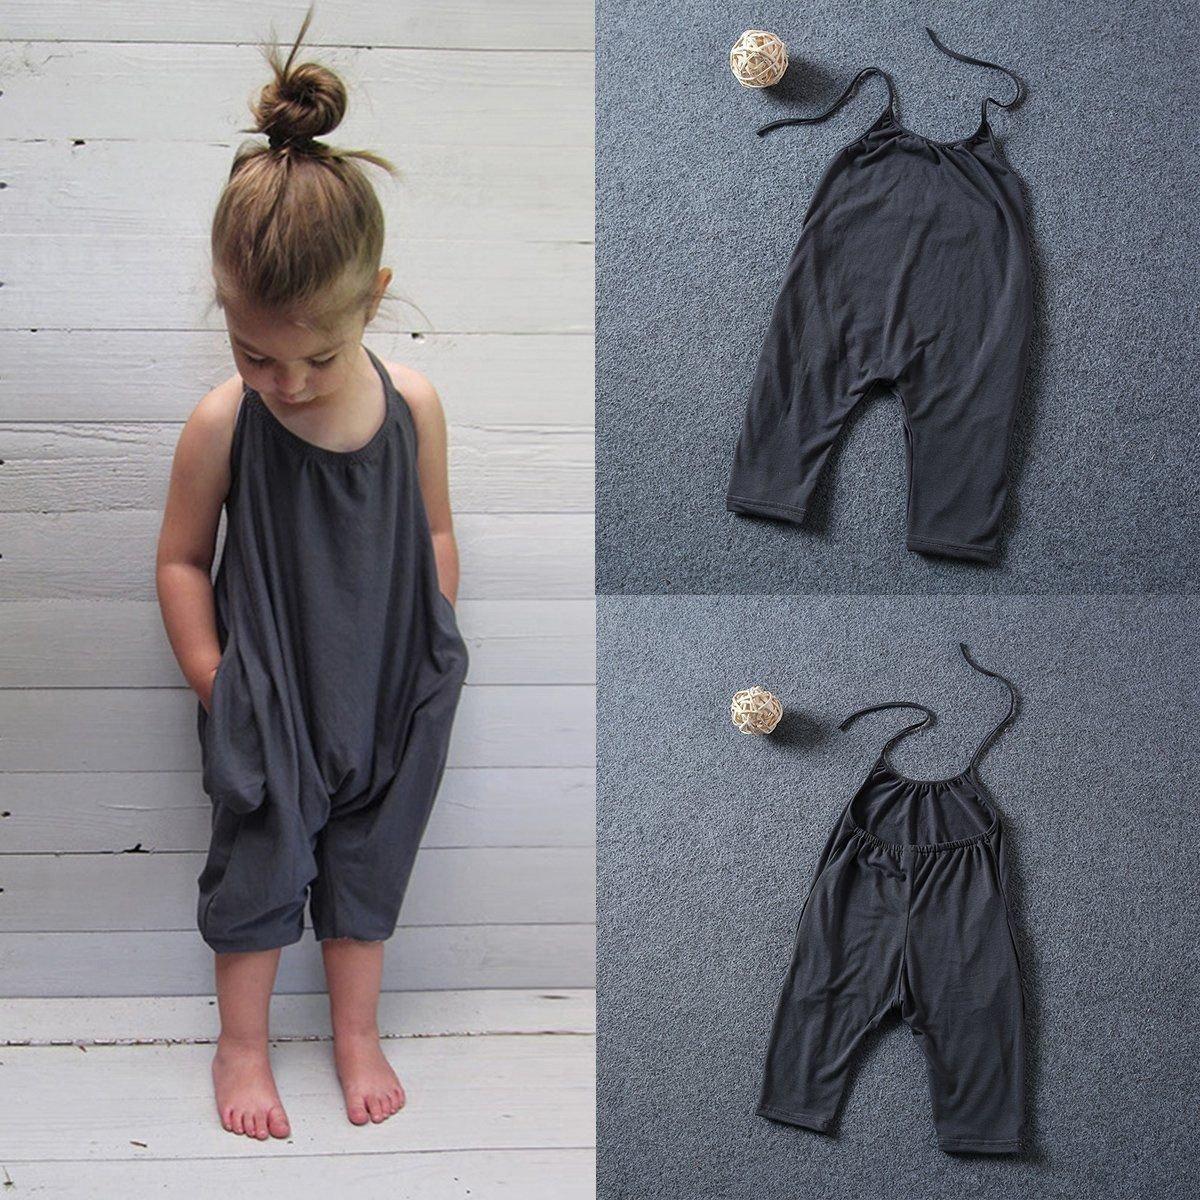 Baggy Romper   Minis   Pinterest   Nähen, Kinderkleidung und Diy nähen